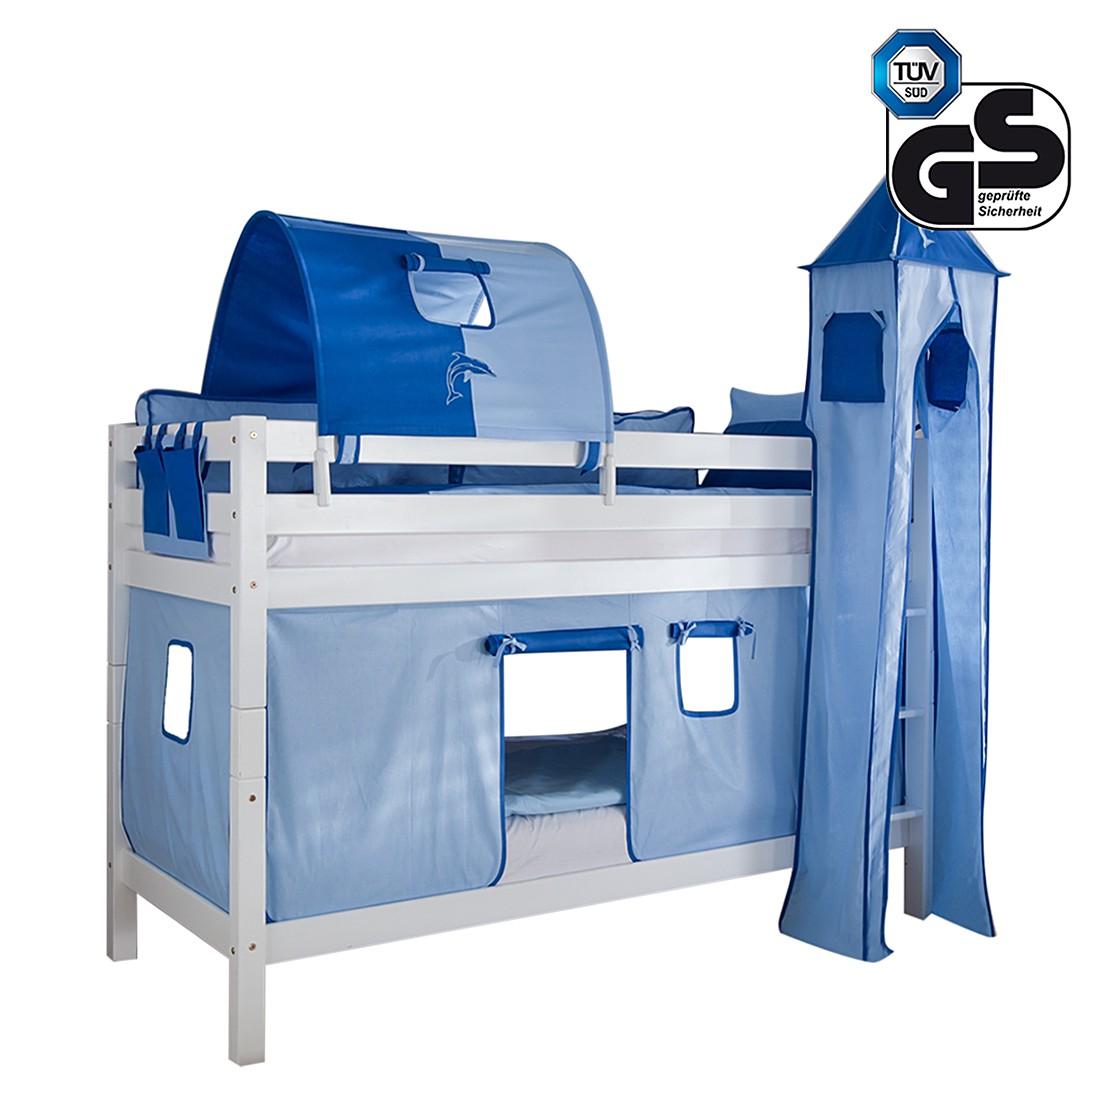 Etagenbett Beni - Buche massiv/Weiß mit Textilset Blau/Delfin, Relita